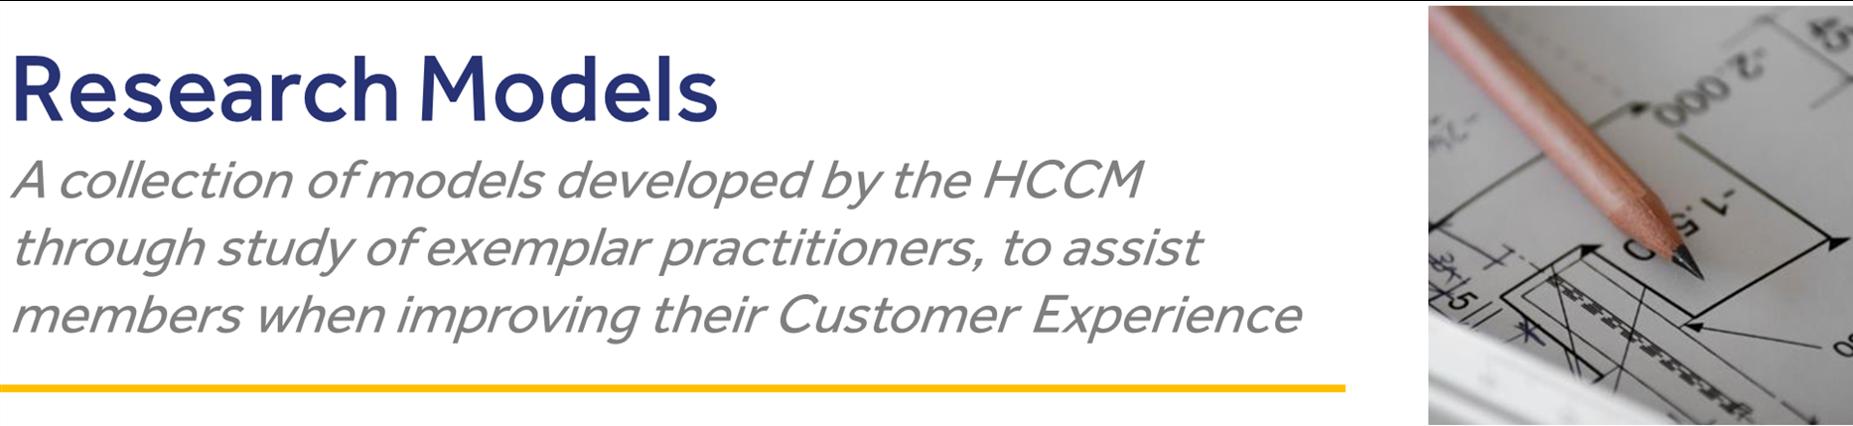 HCCM Research Models